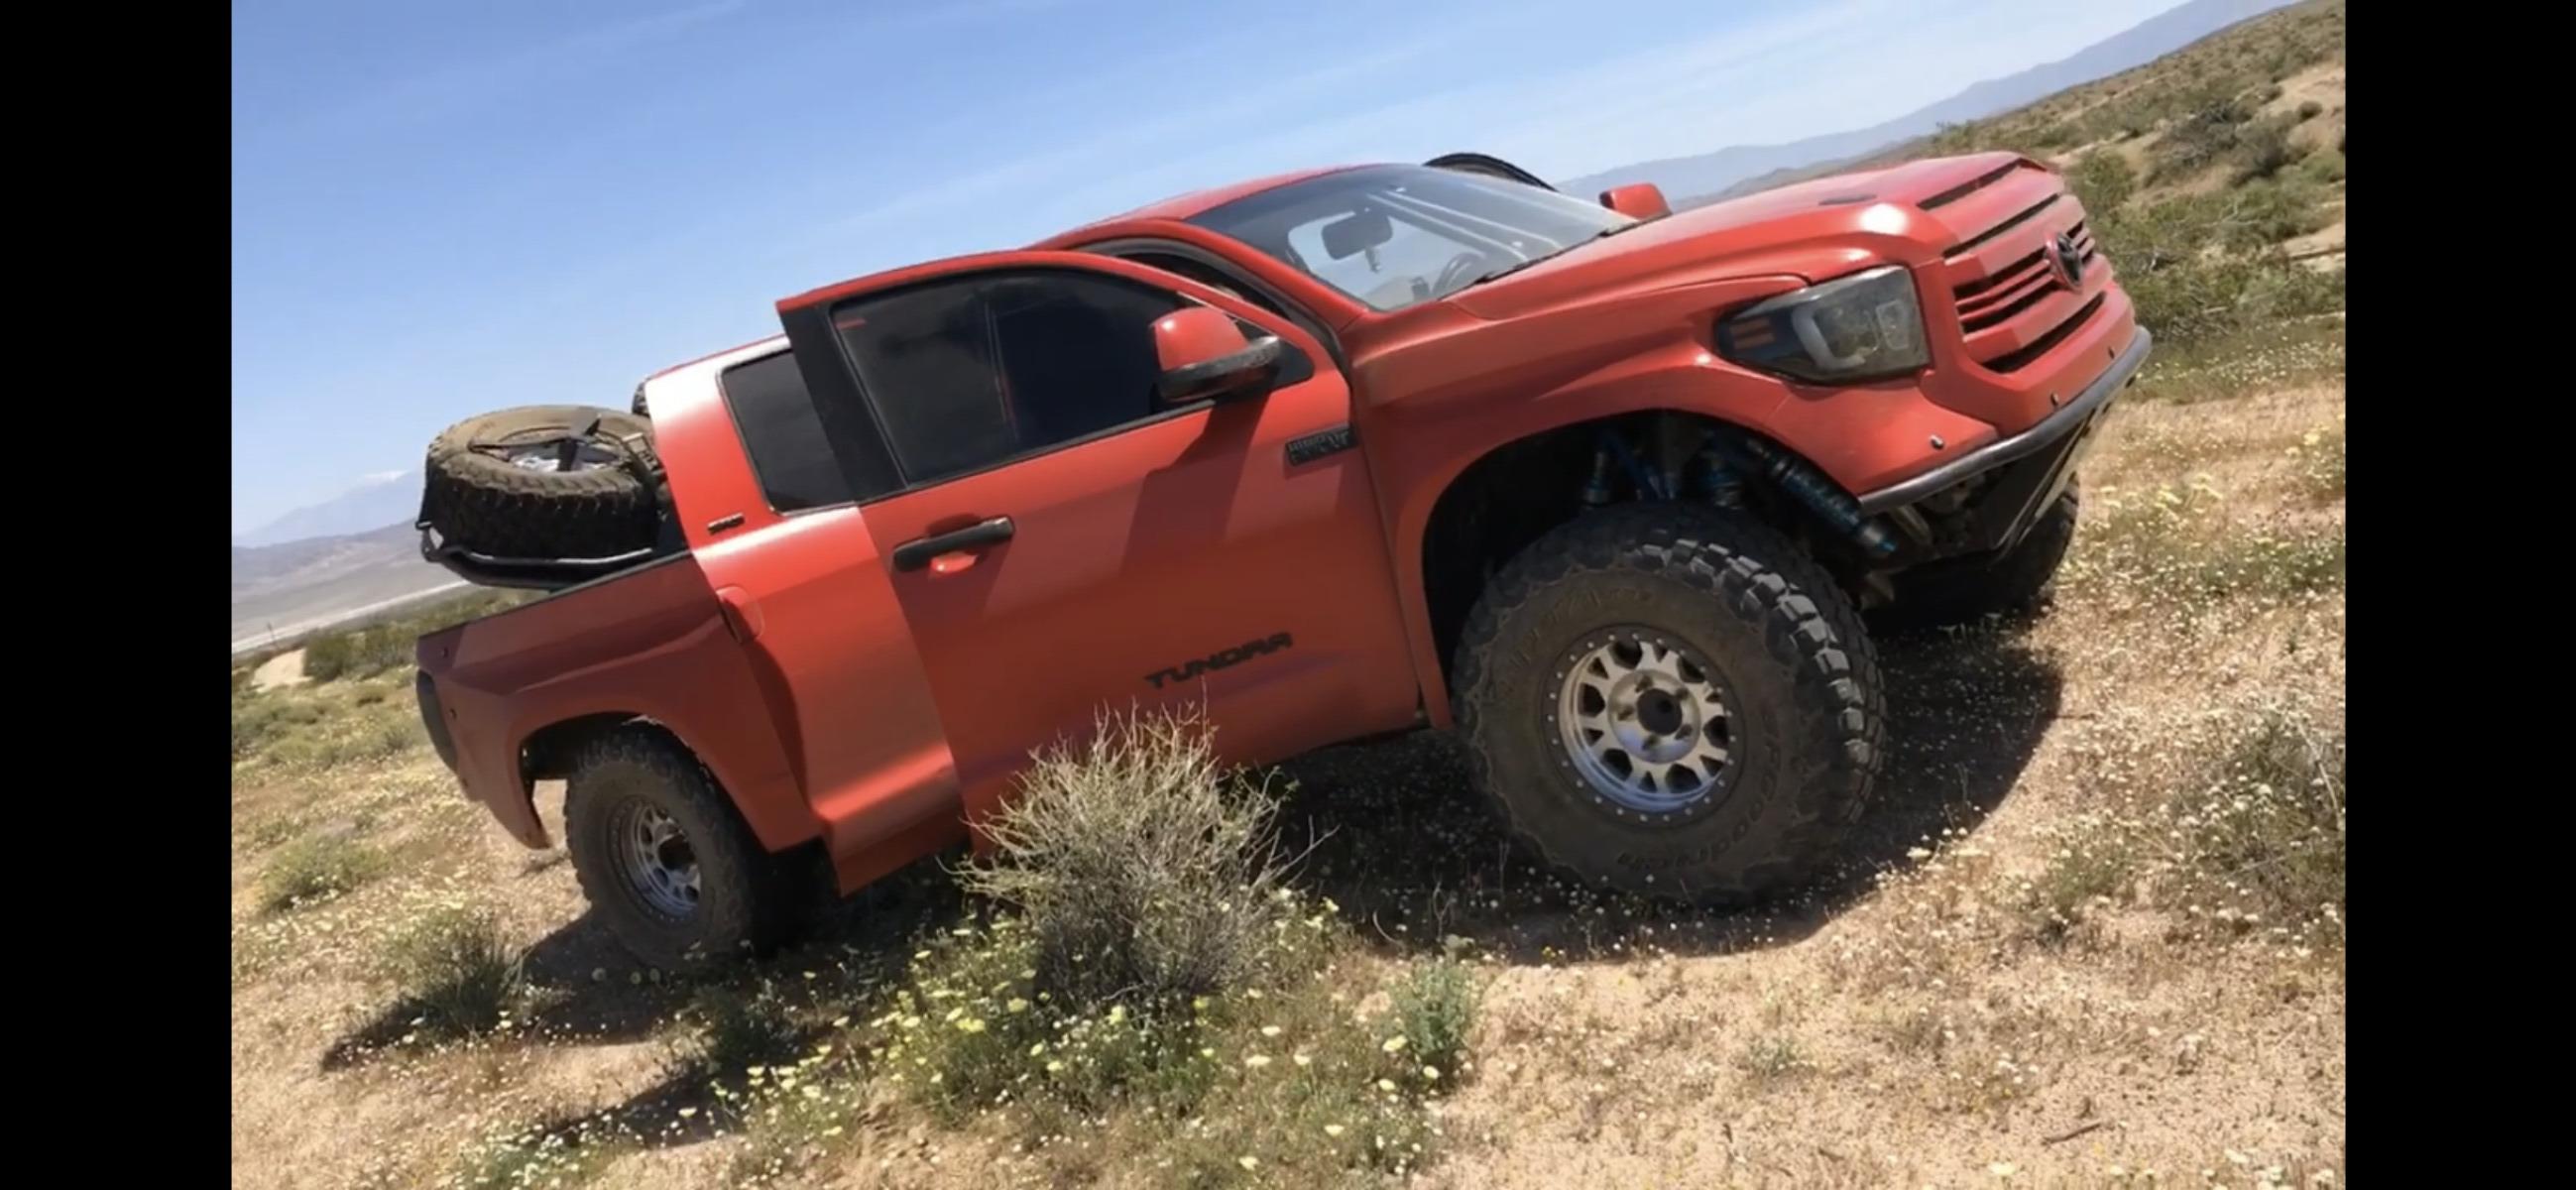 For Sale: Toyota Tundra Prerunner - photo1